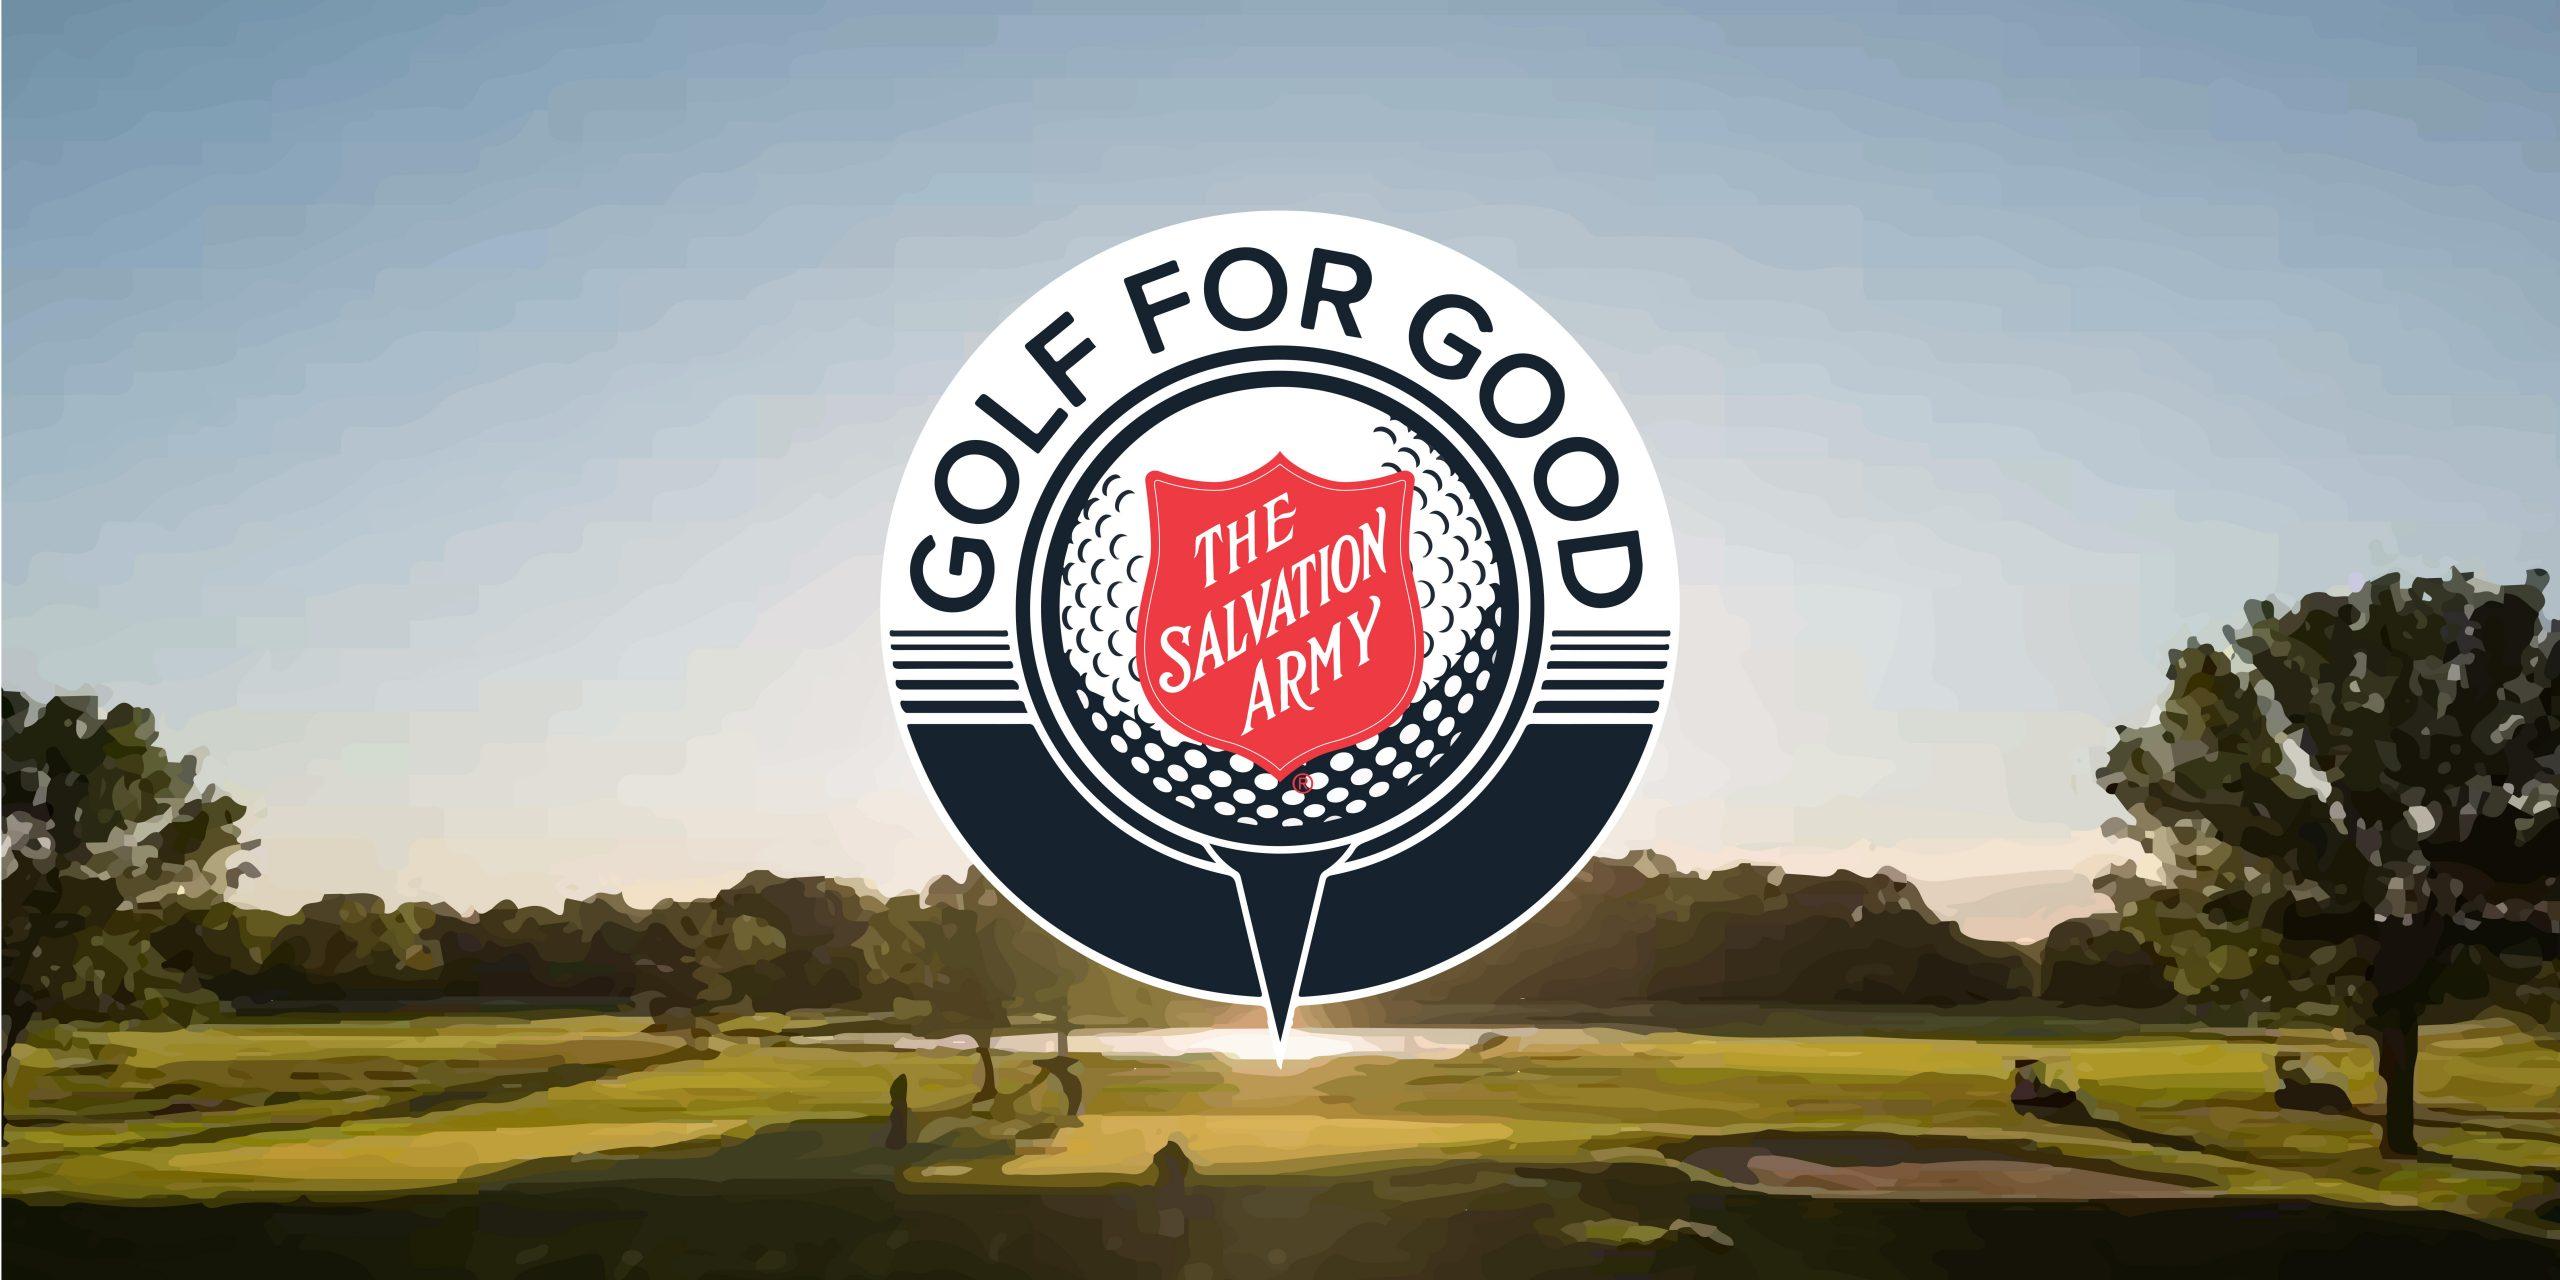 Golf For Good